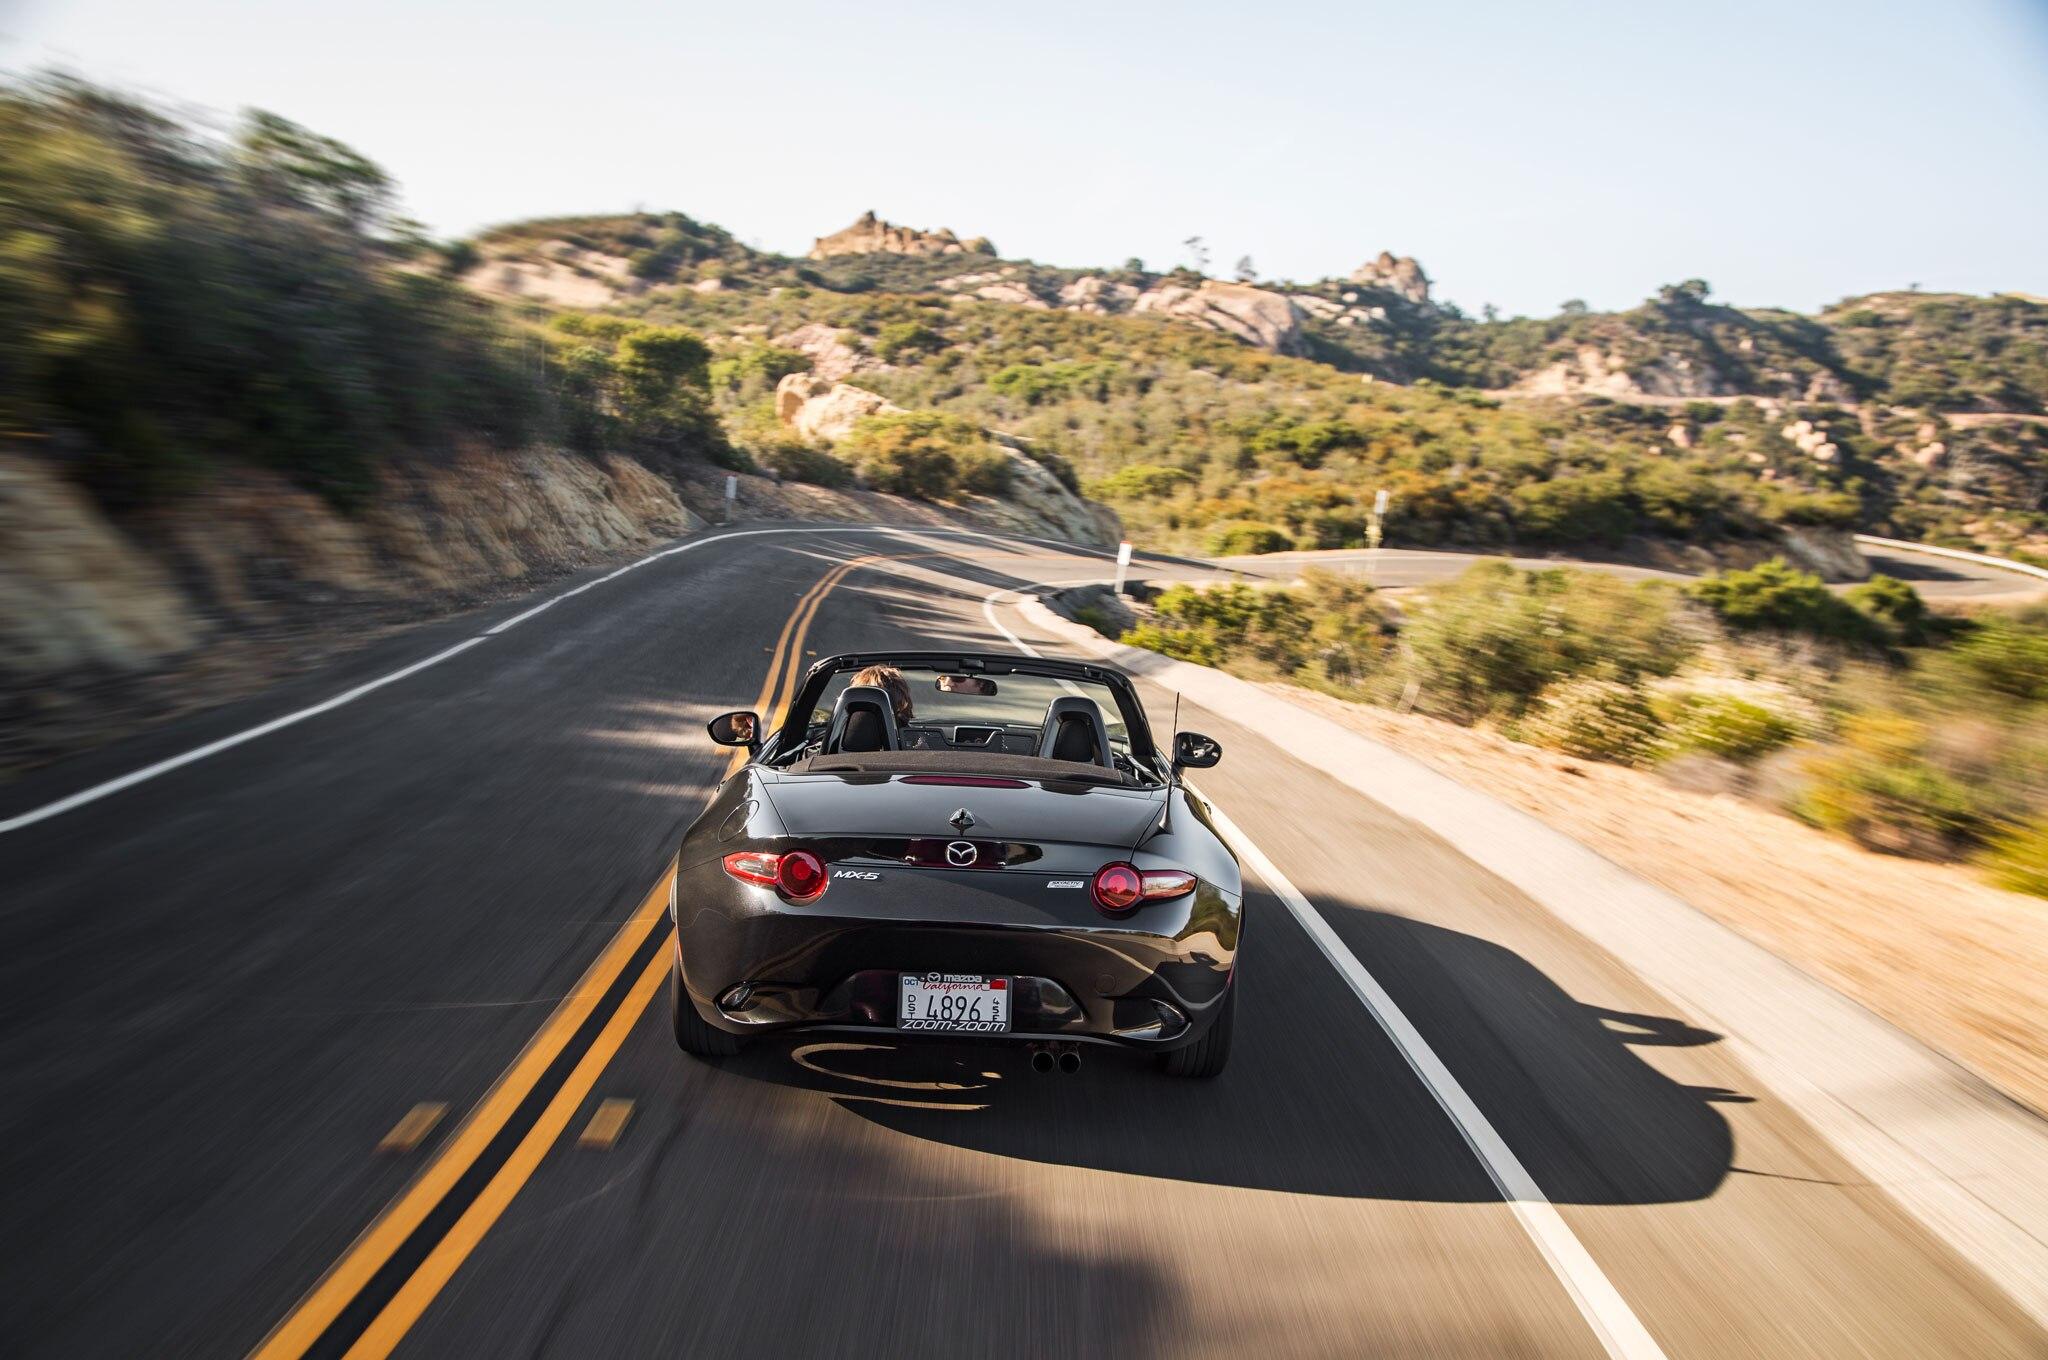 2016 Mazda MX 5 Miata Club Review